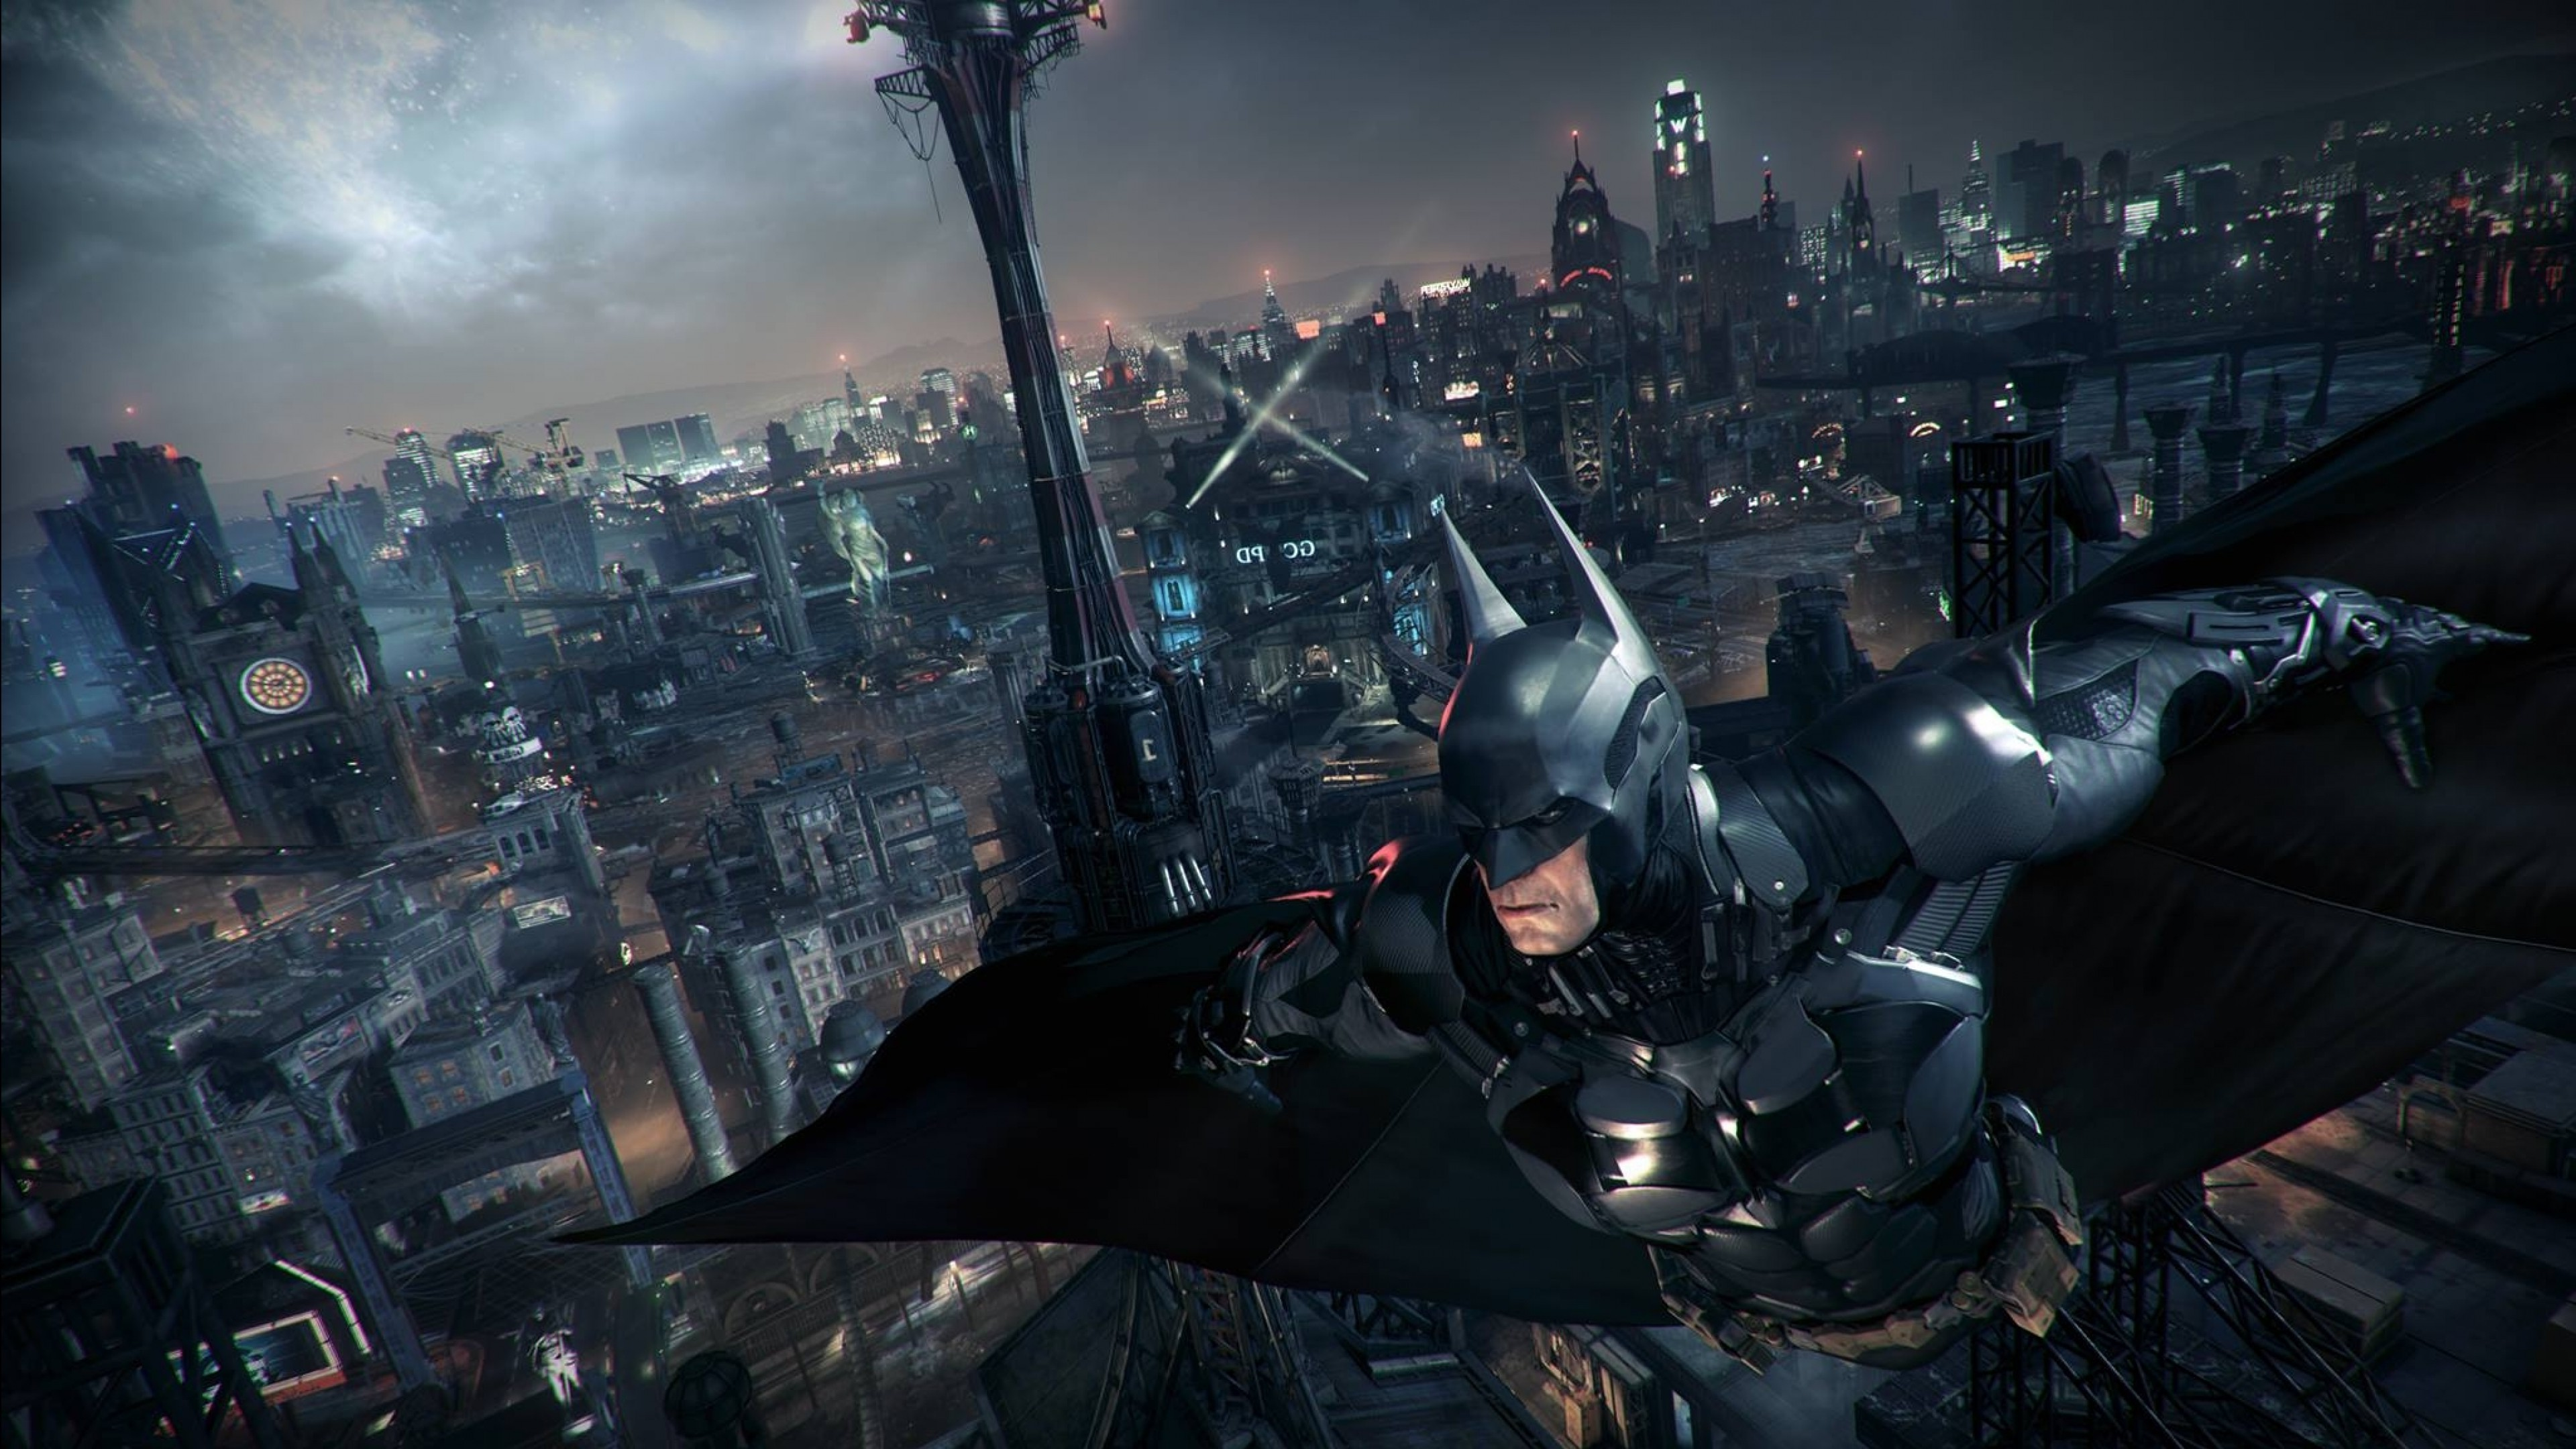 Gotham city background 62 images - Gotham wallpaper ...